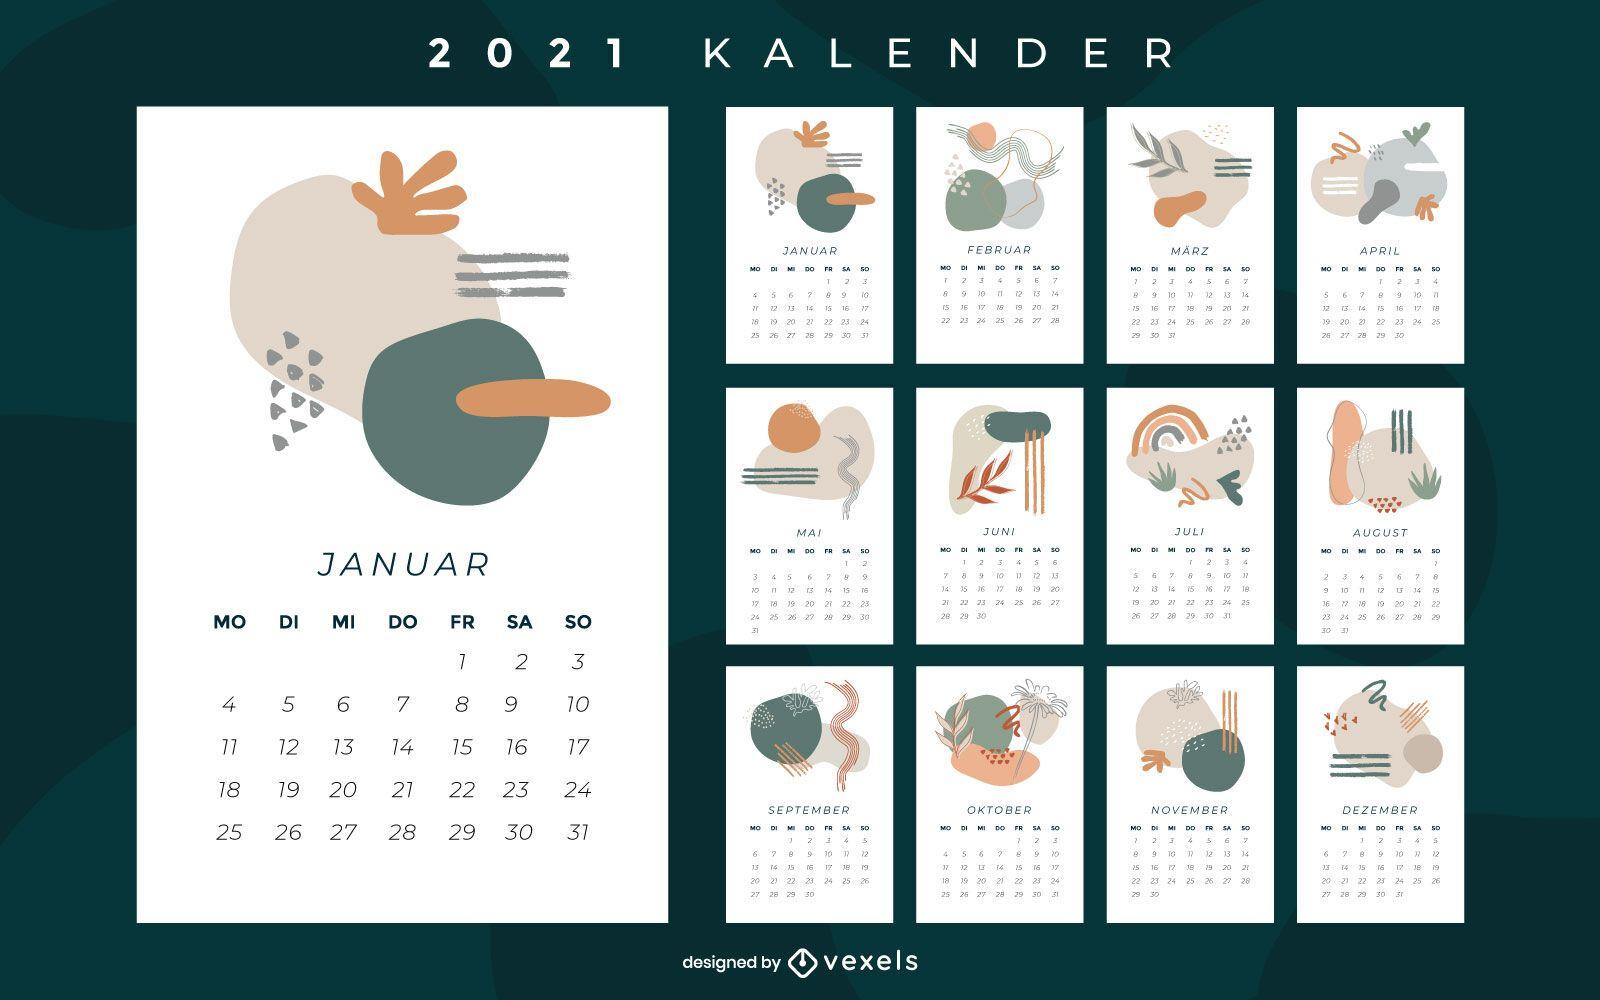 Abstract 2021 german calendar design